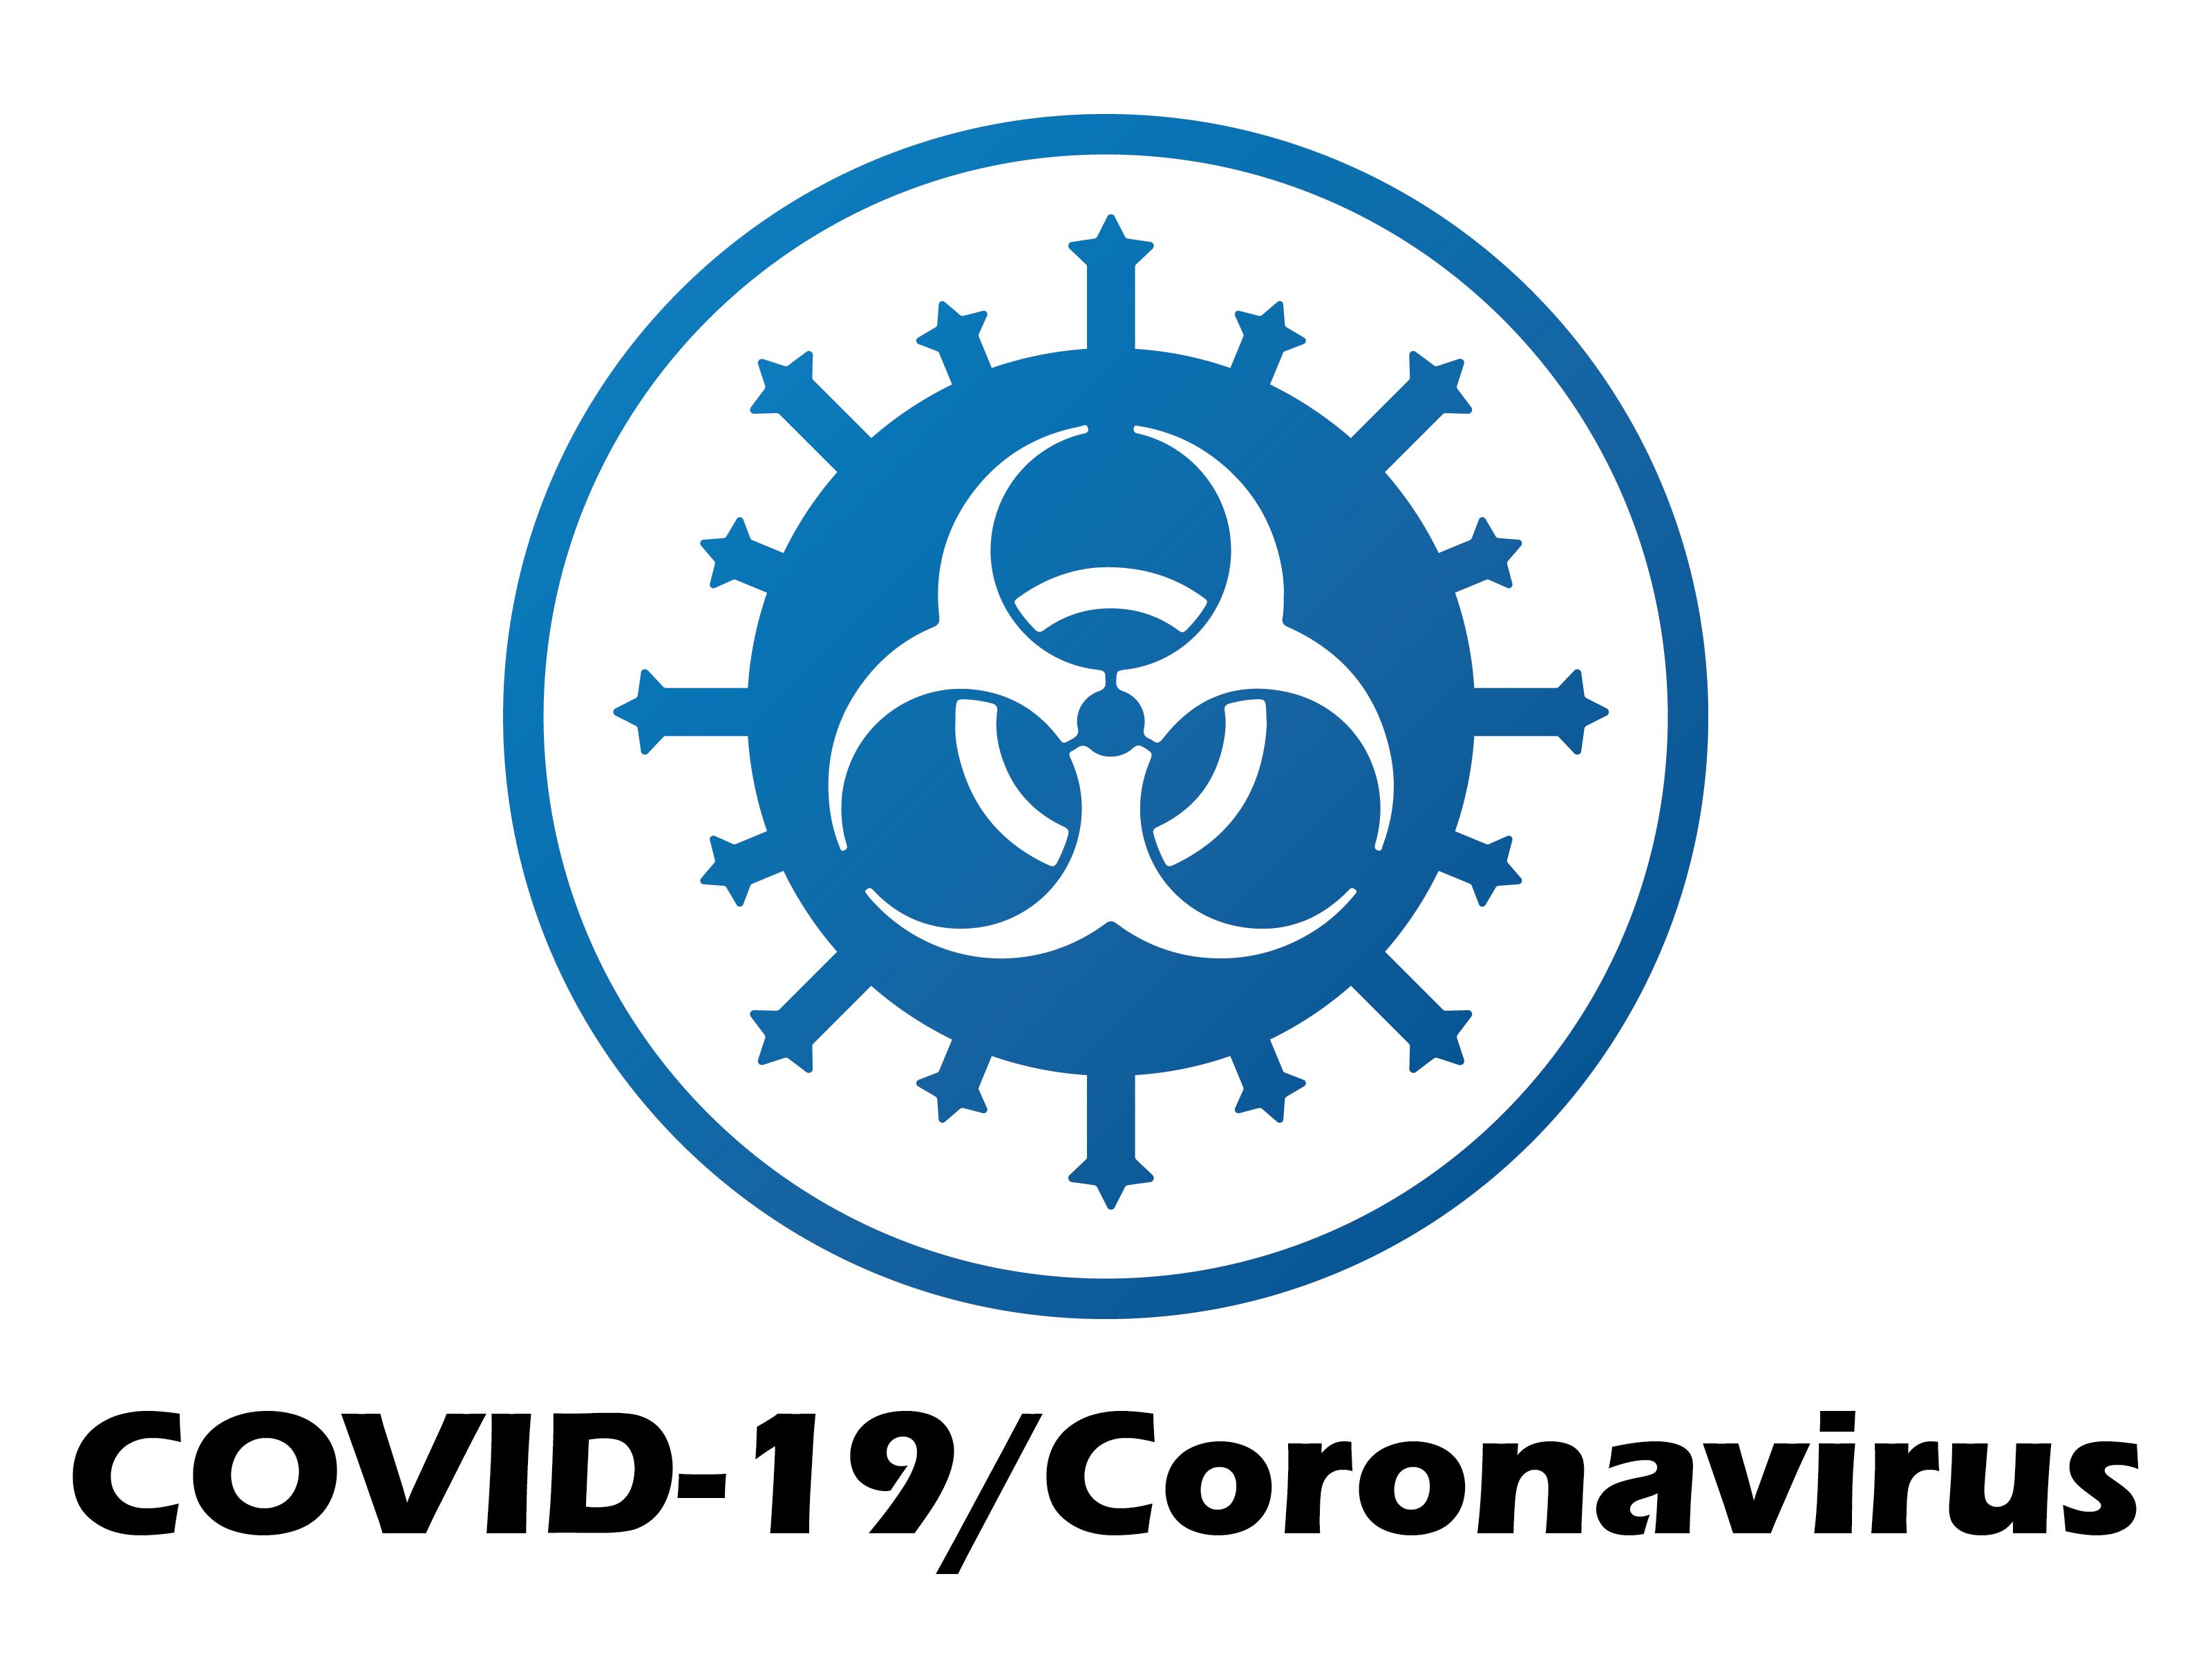 COVID-19/Coronavirus Awareness & Prevention (AU Version)